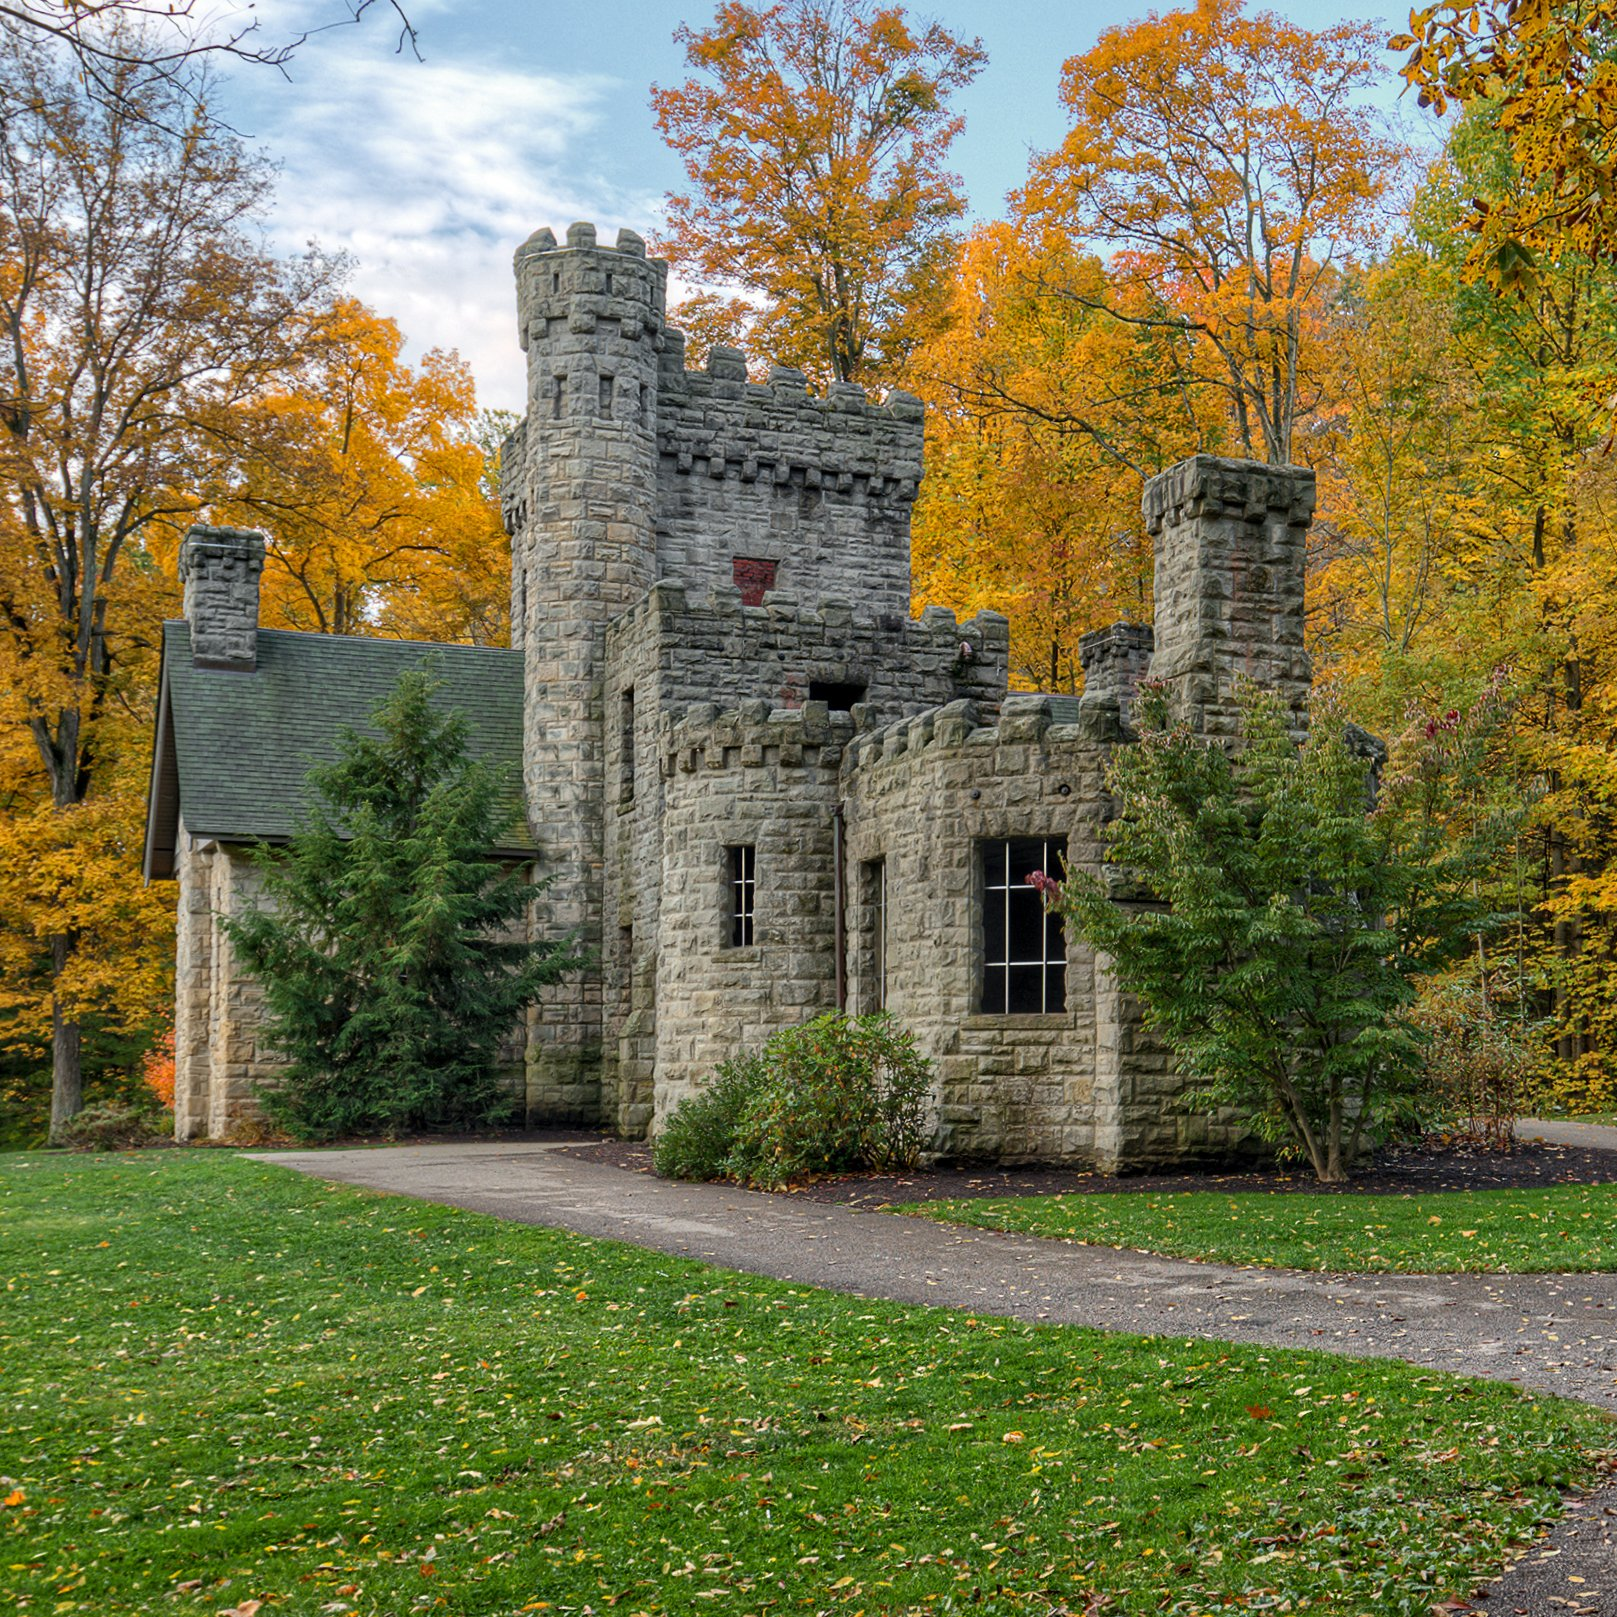 Squire's Castle in Willoughby Hills, Ohio.